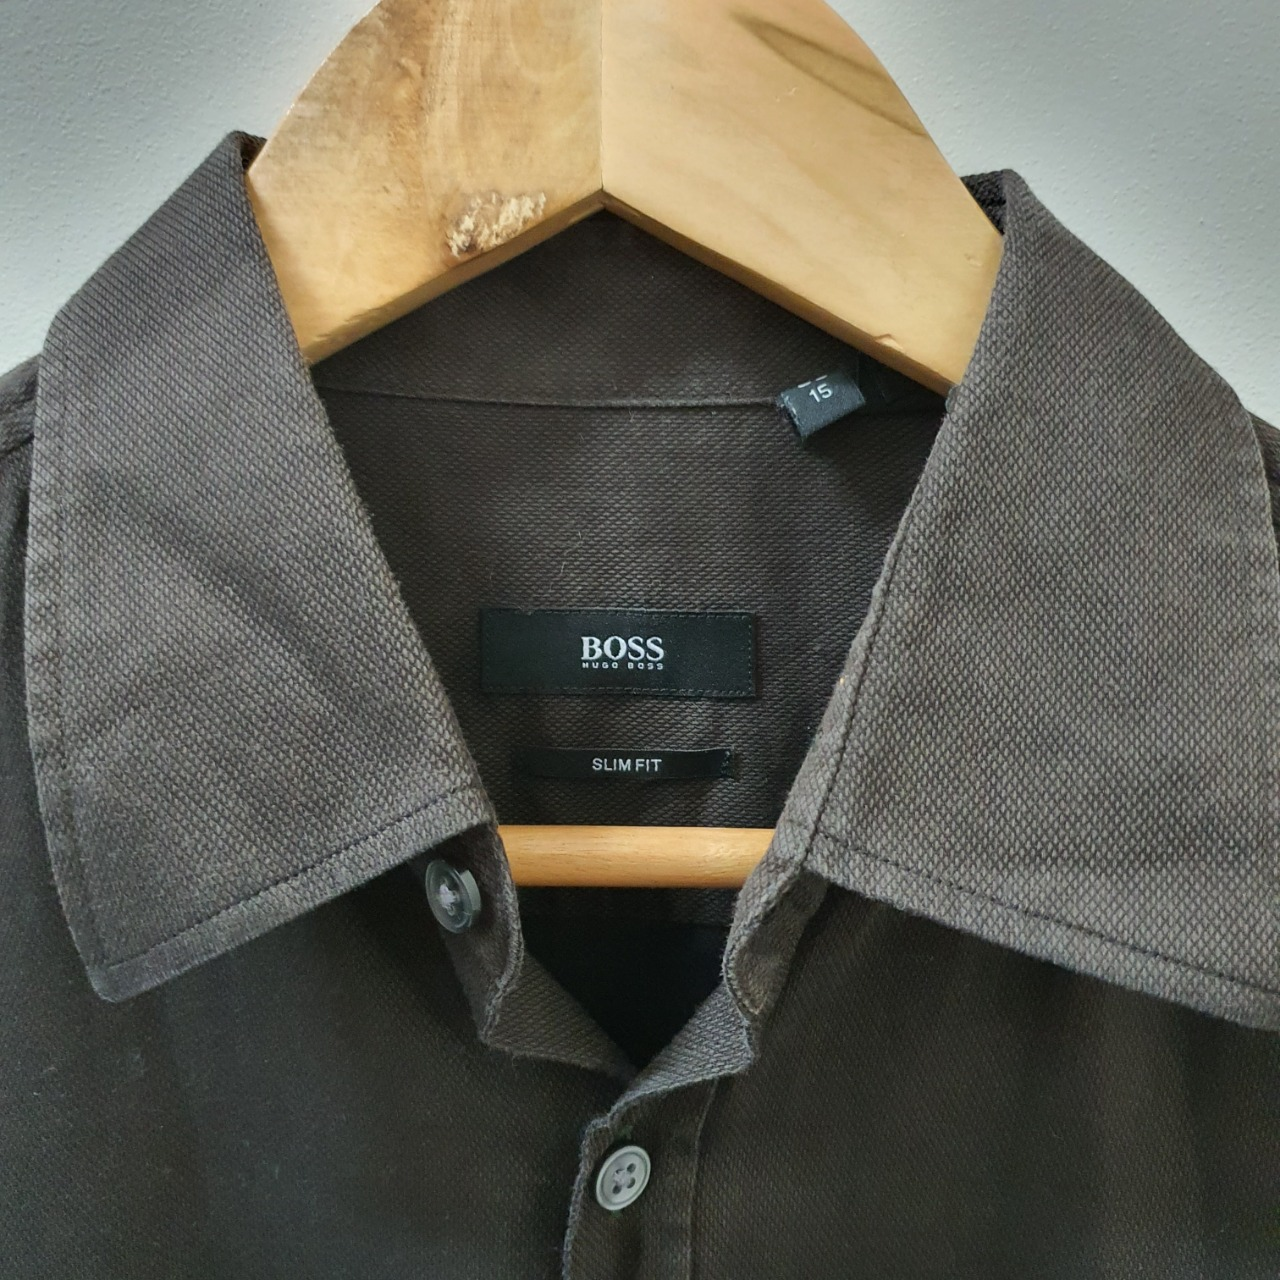 Men's 'Hugo Boss' Long Sleeve Shirt - Size 38